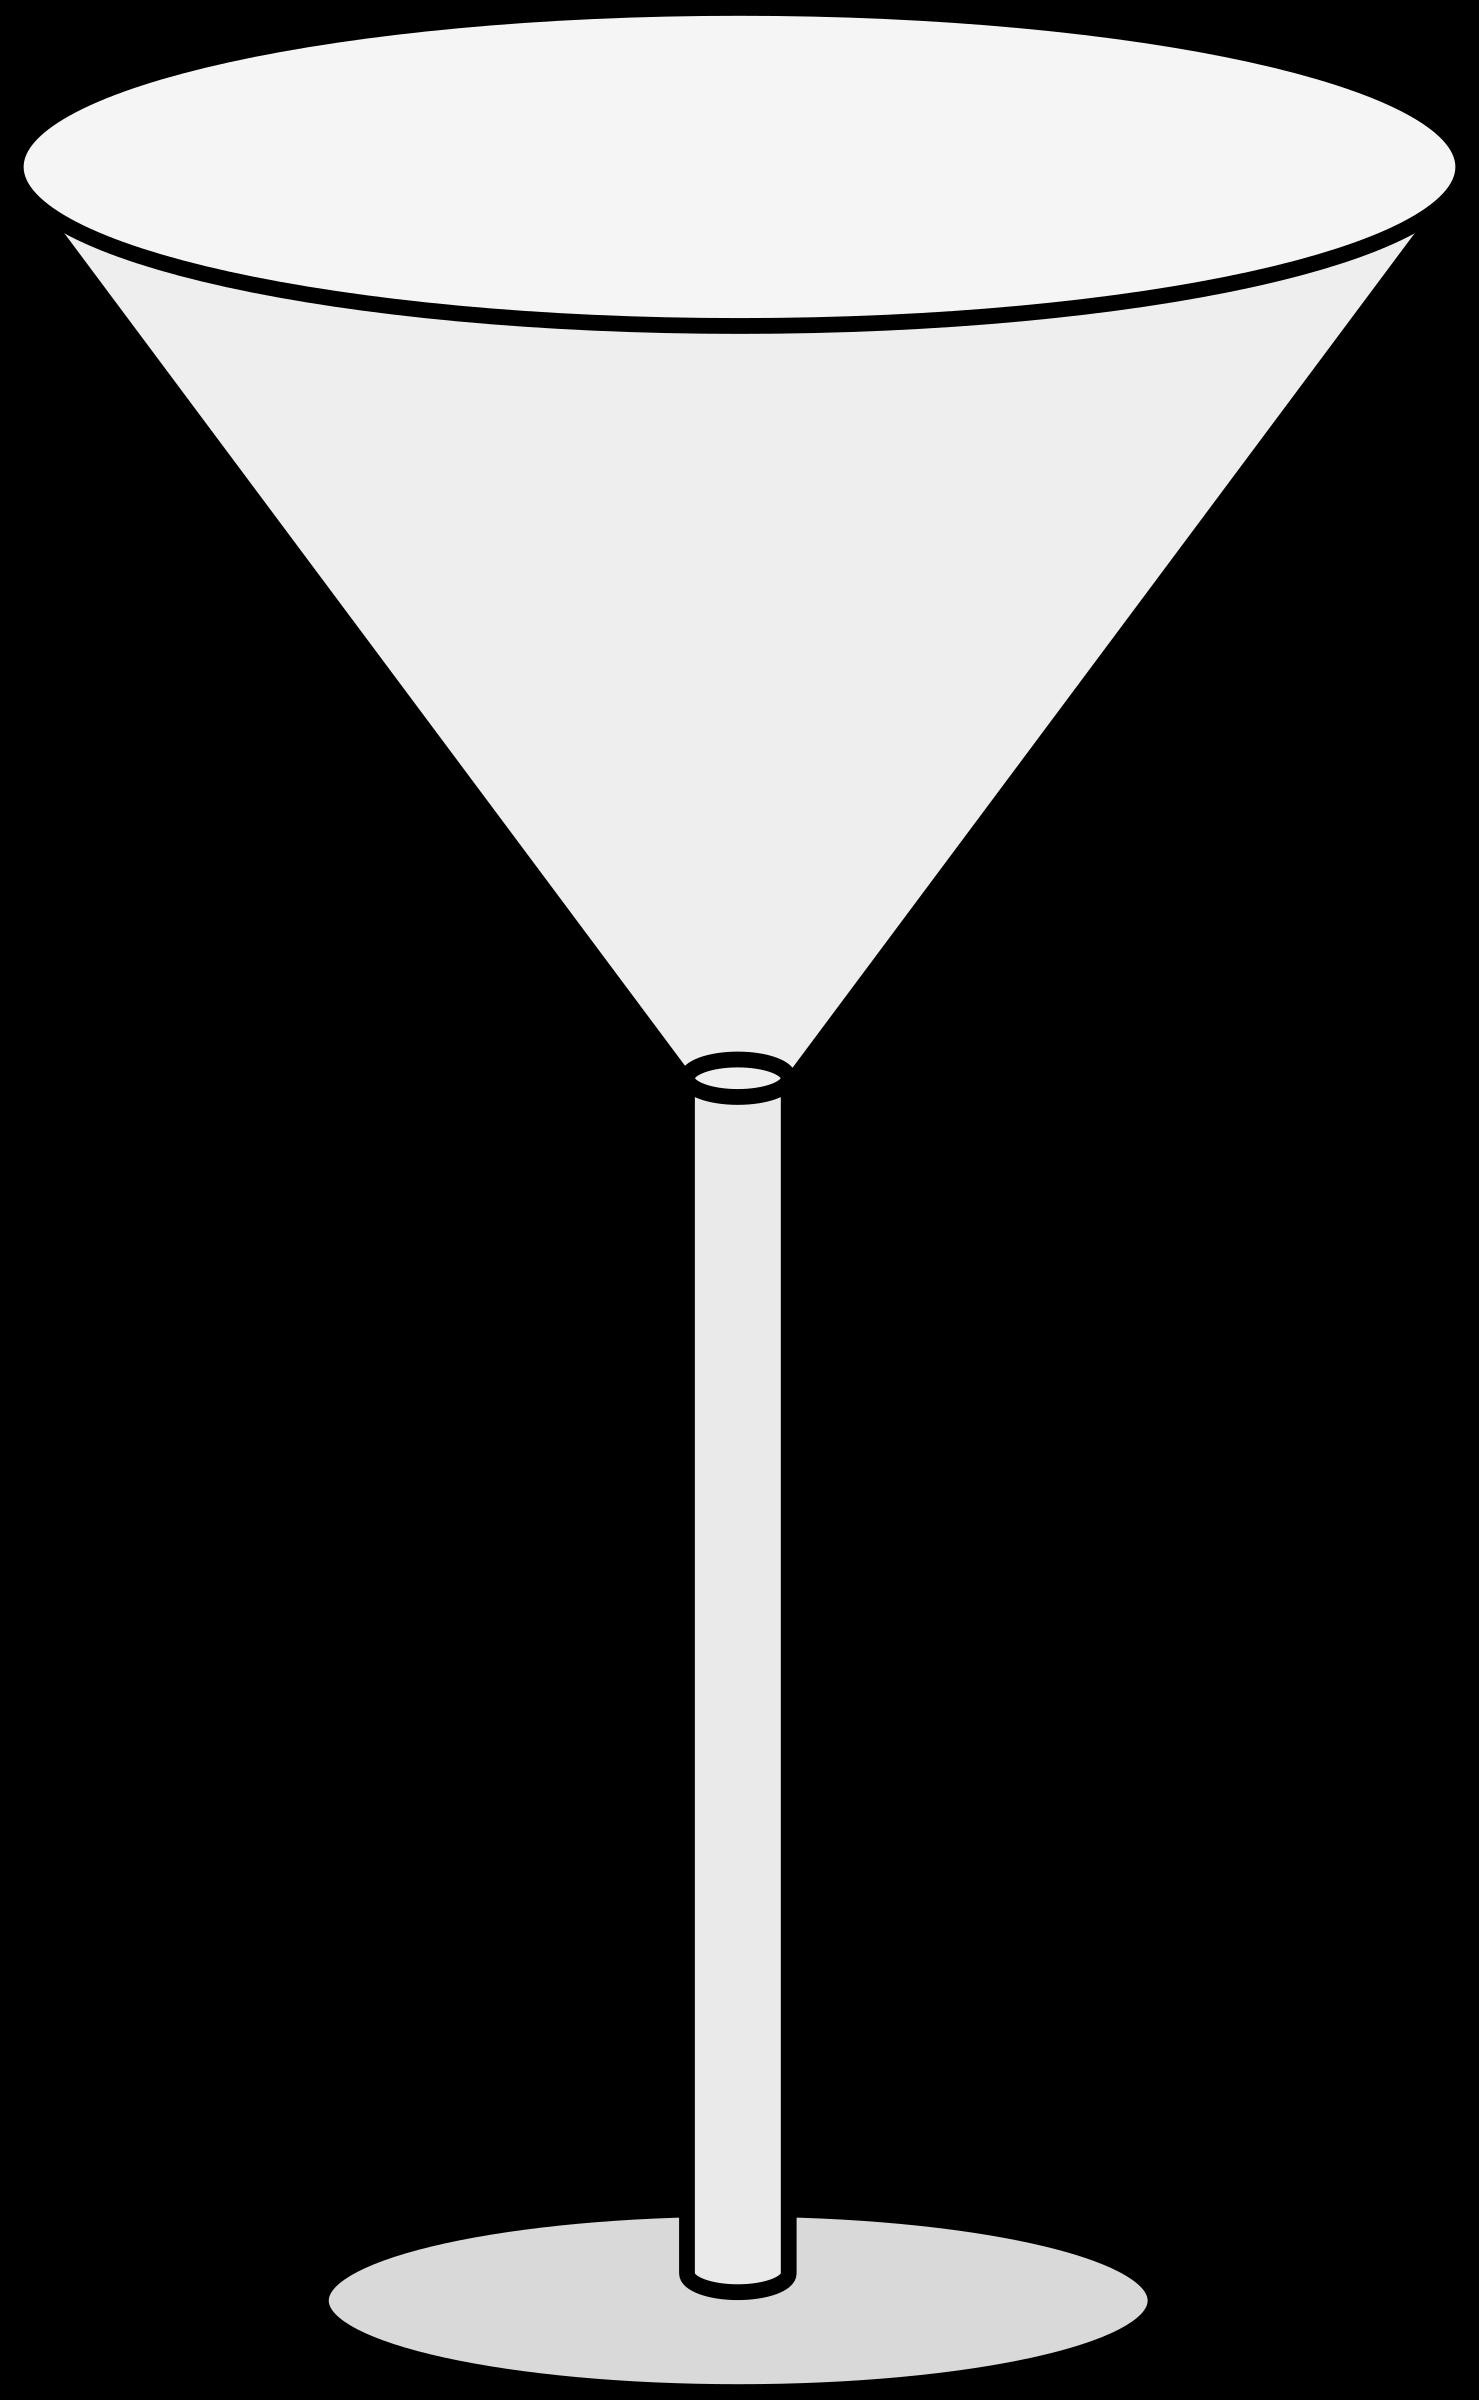 Drinking clipart champagne. Empty martini glass big